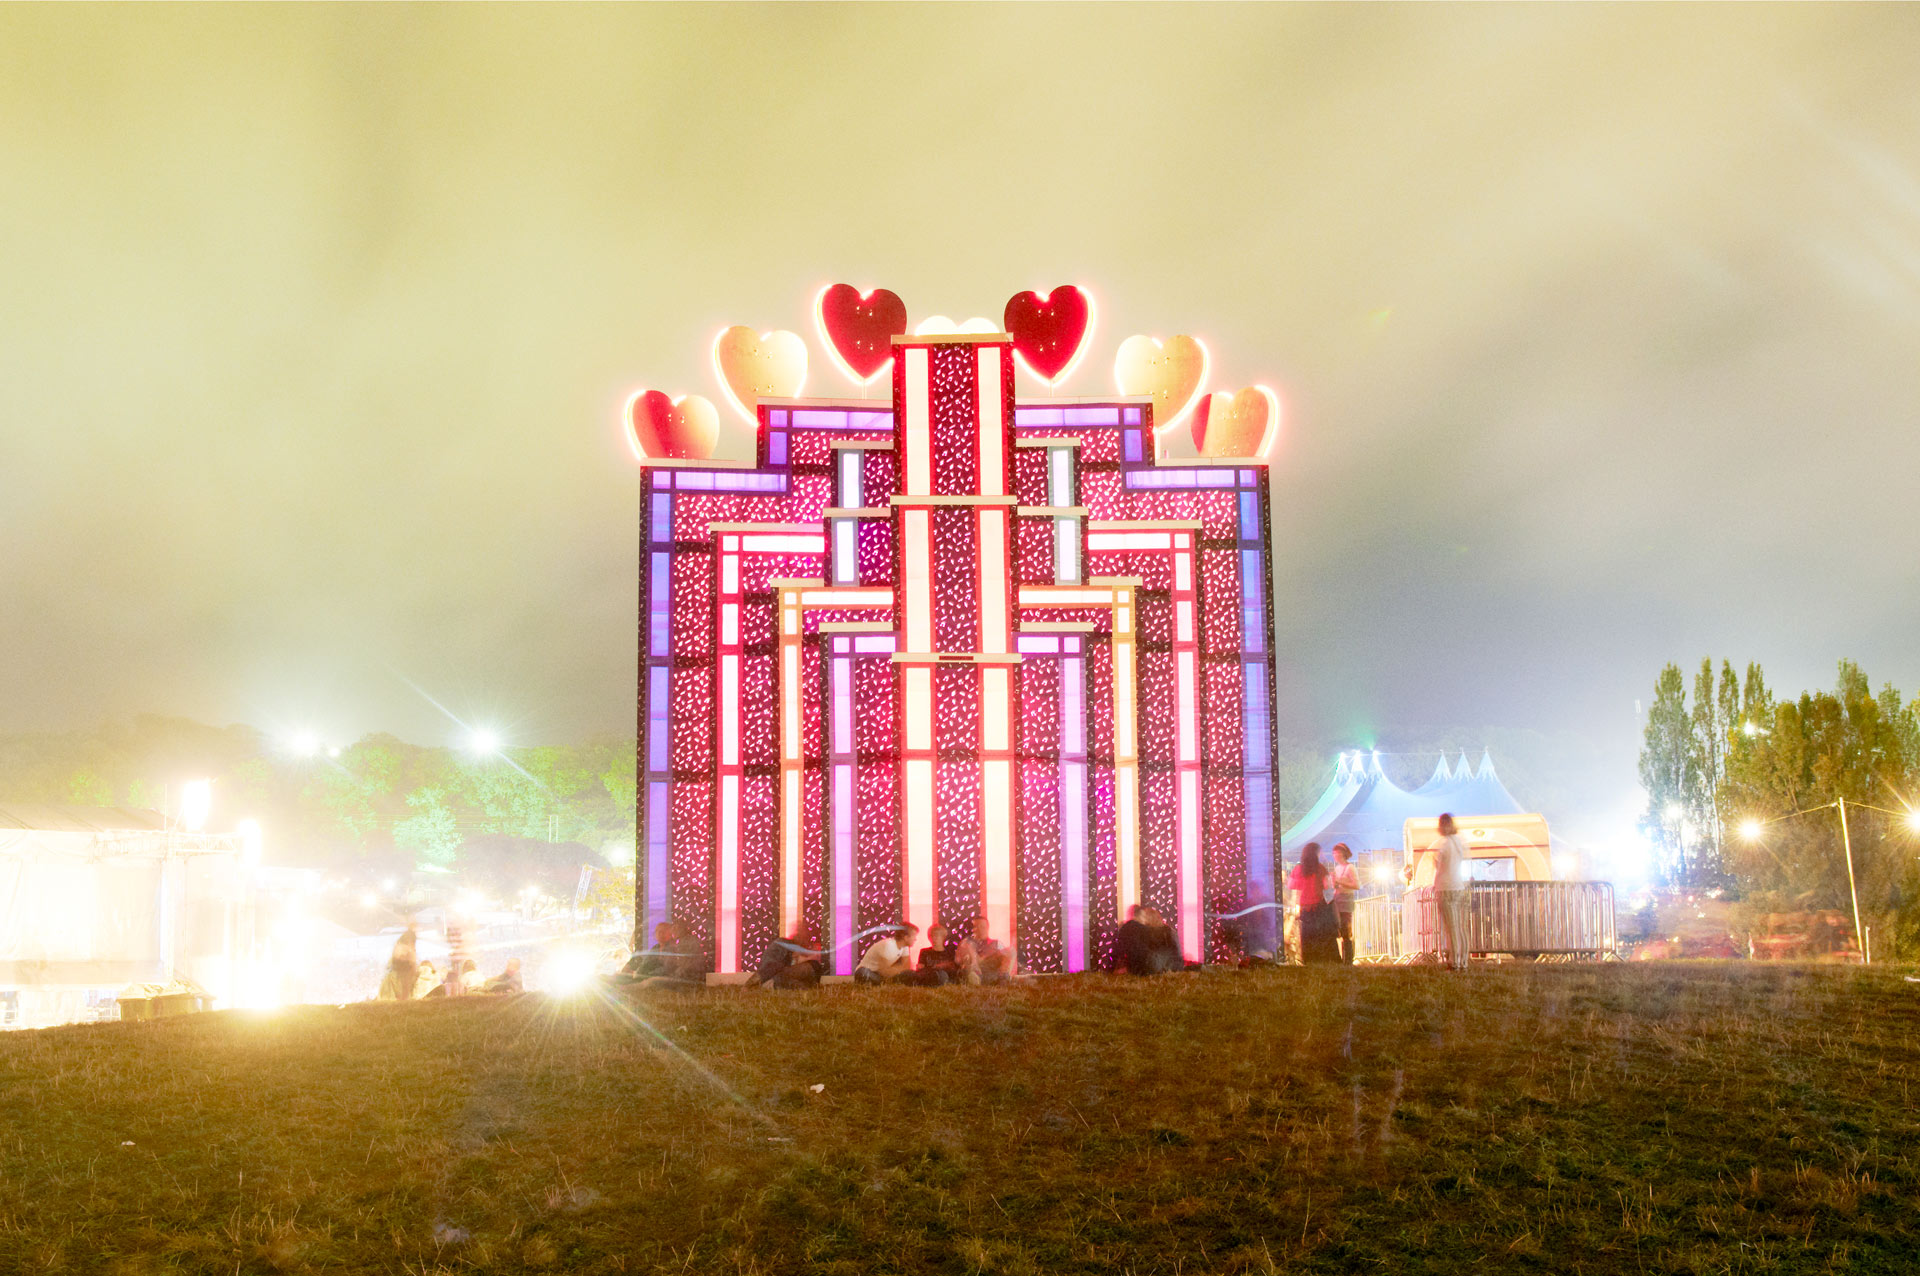 Ben_Festivals_PinkOrgan!